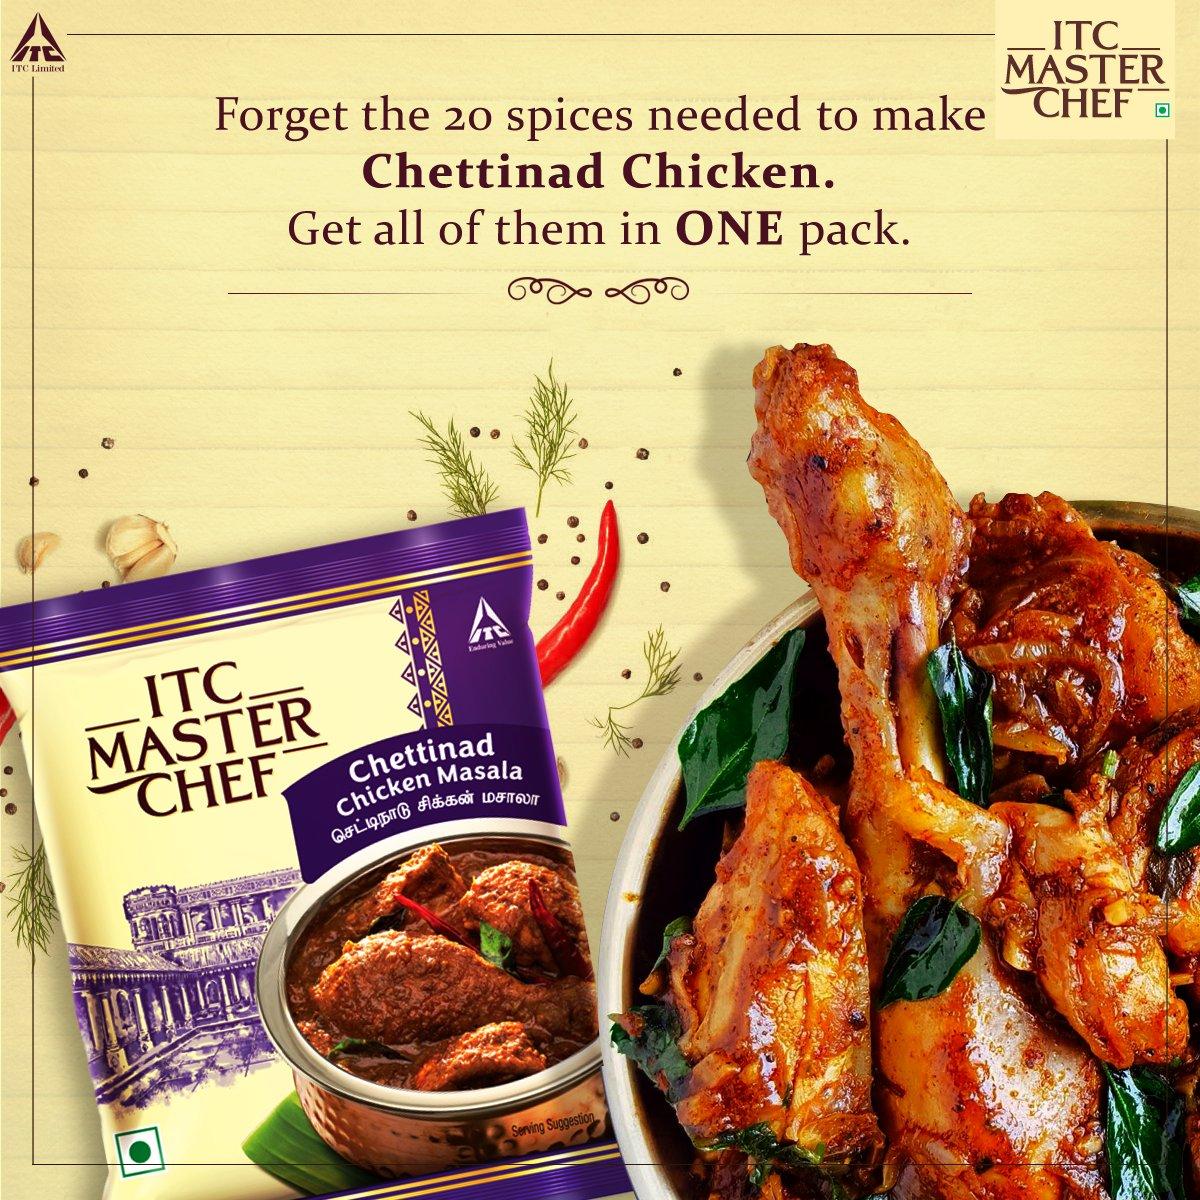 ITC MasterChef Spices's photo on master chef